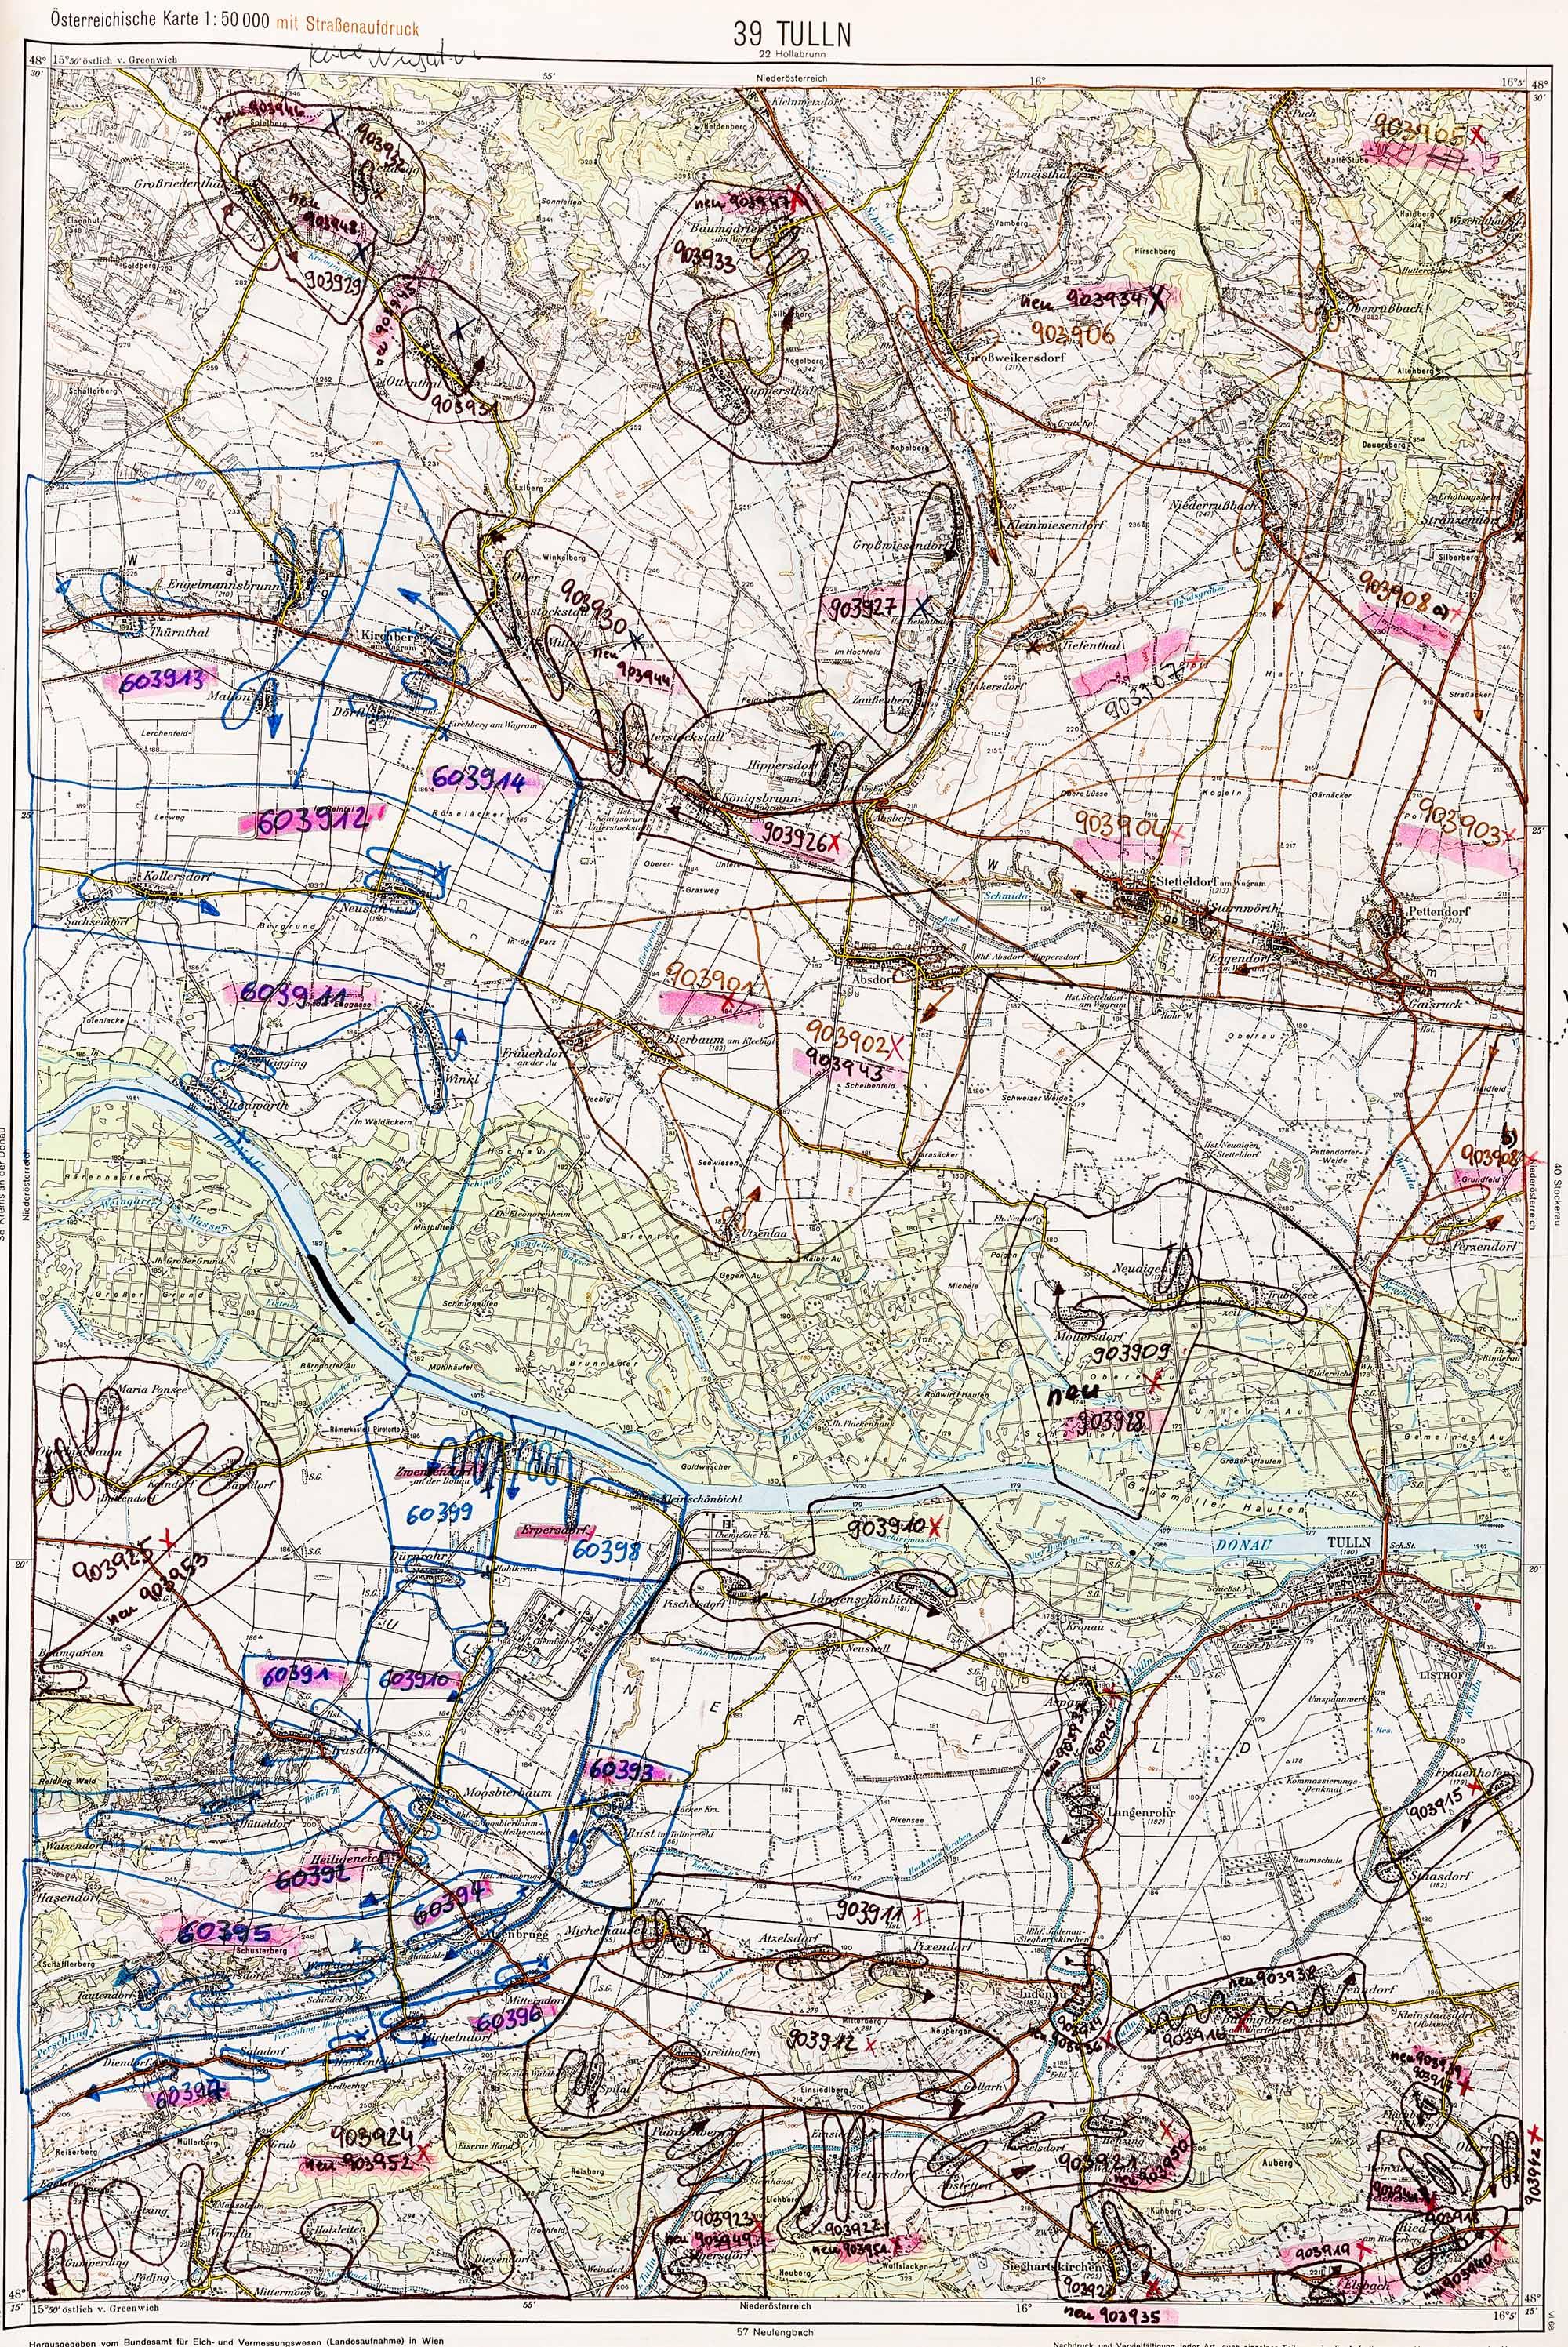 1975-1979 Karte 039